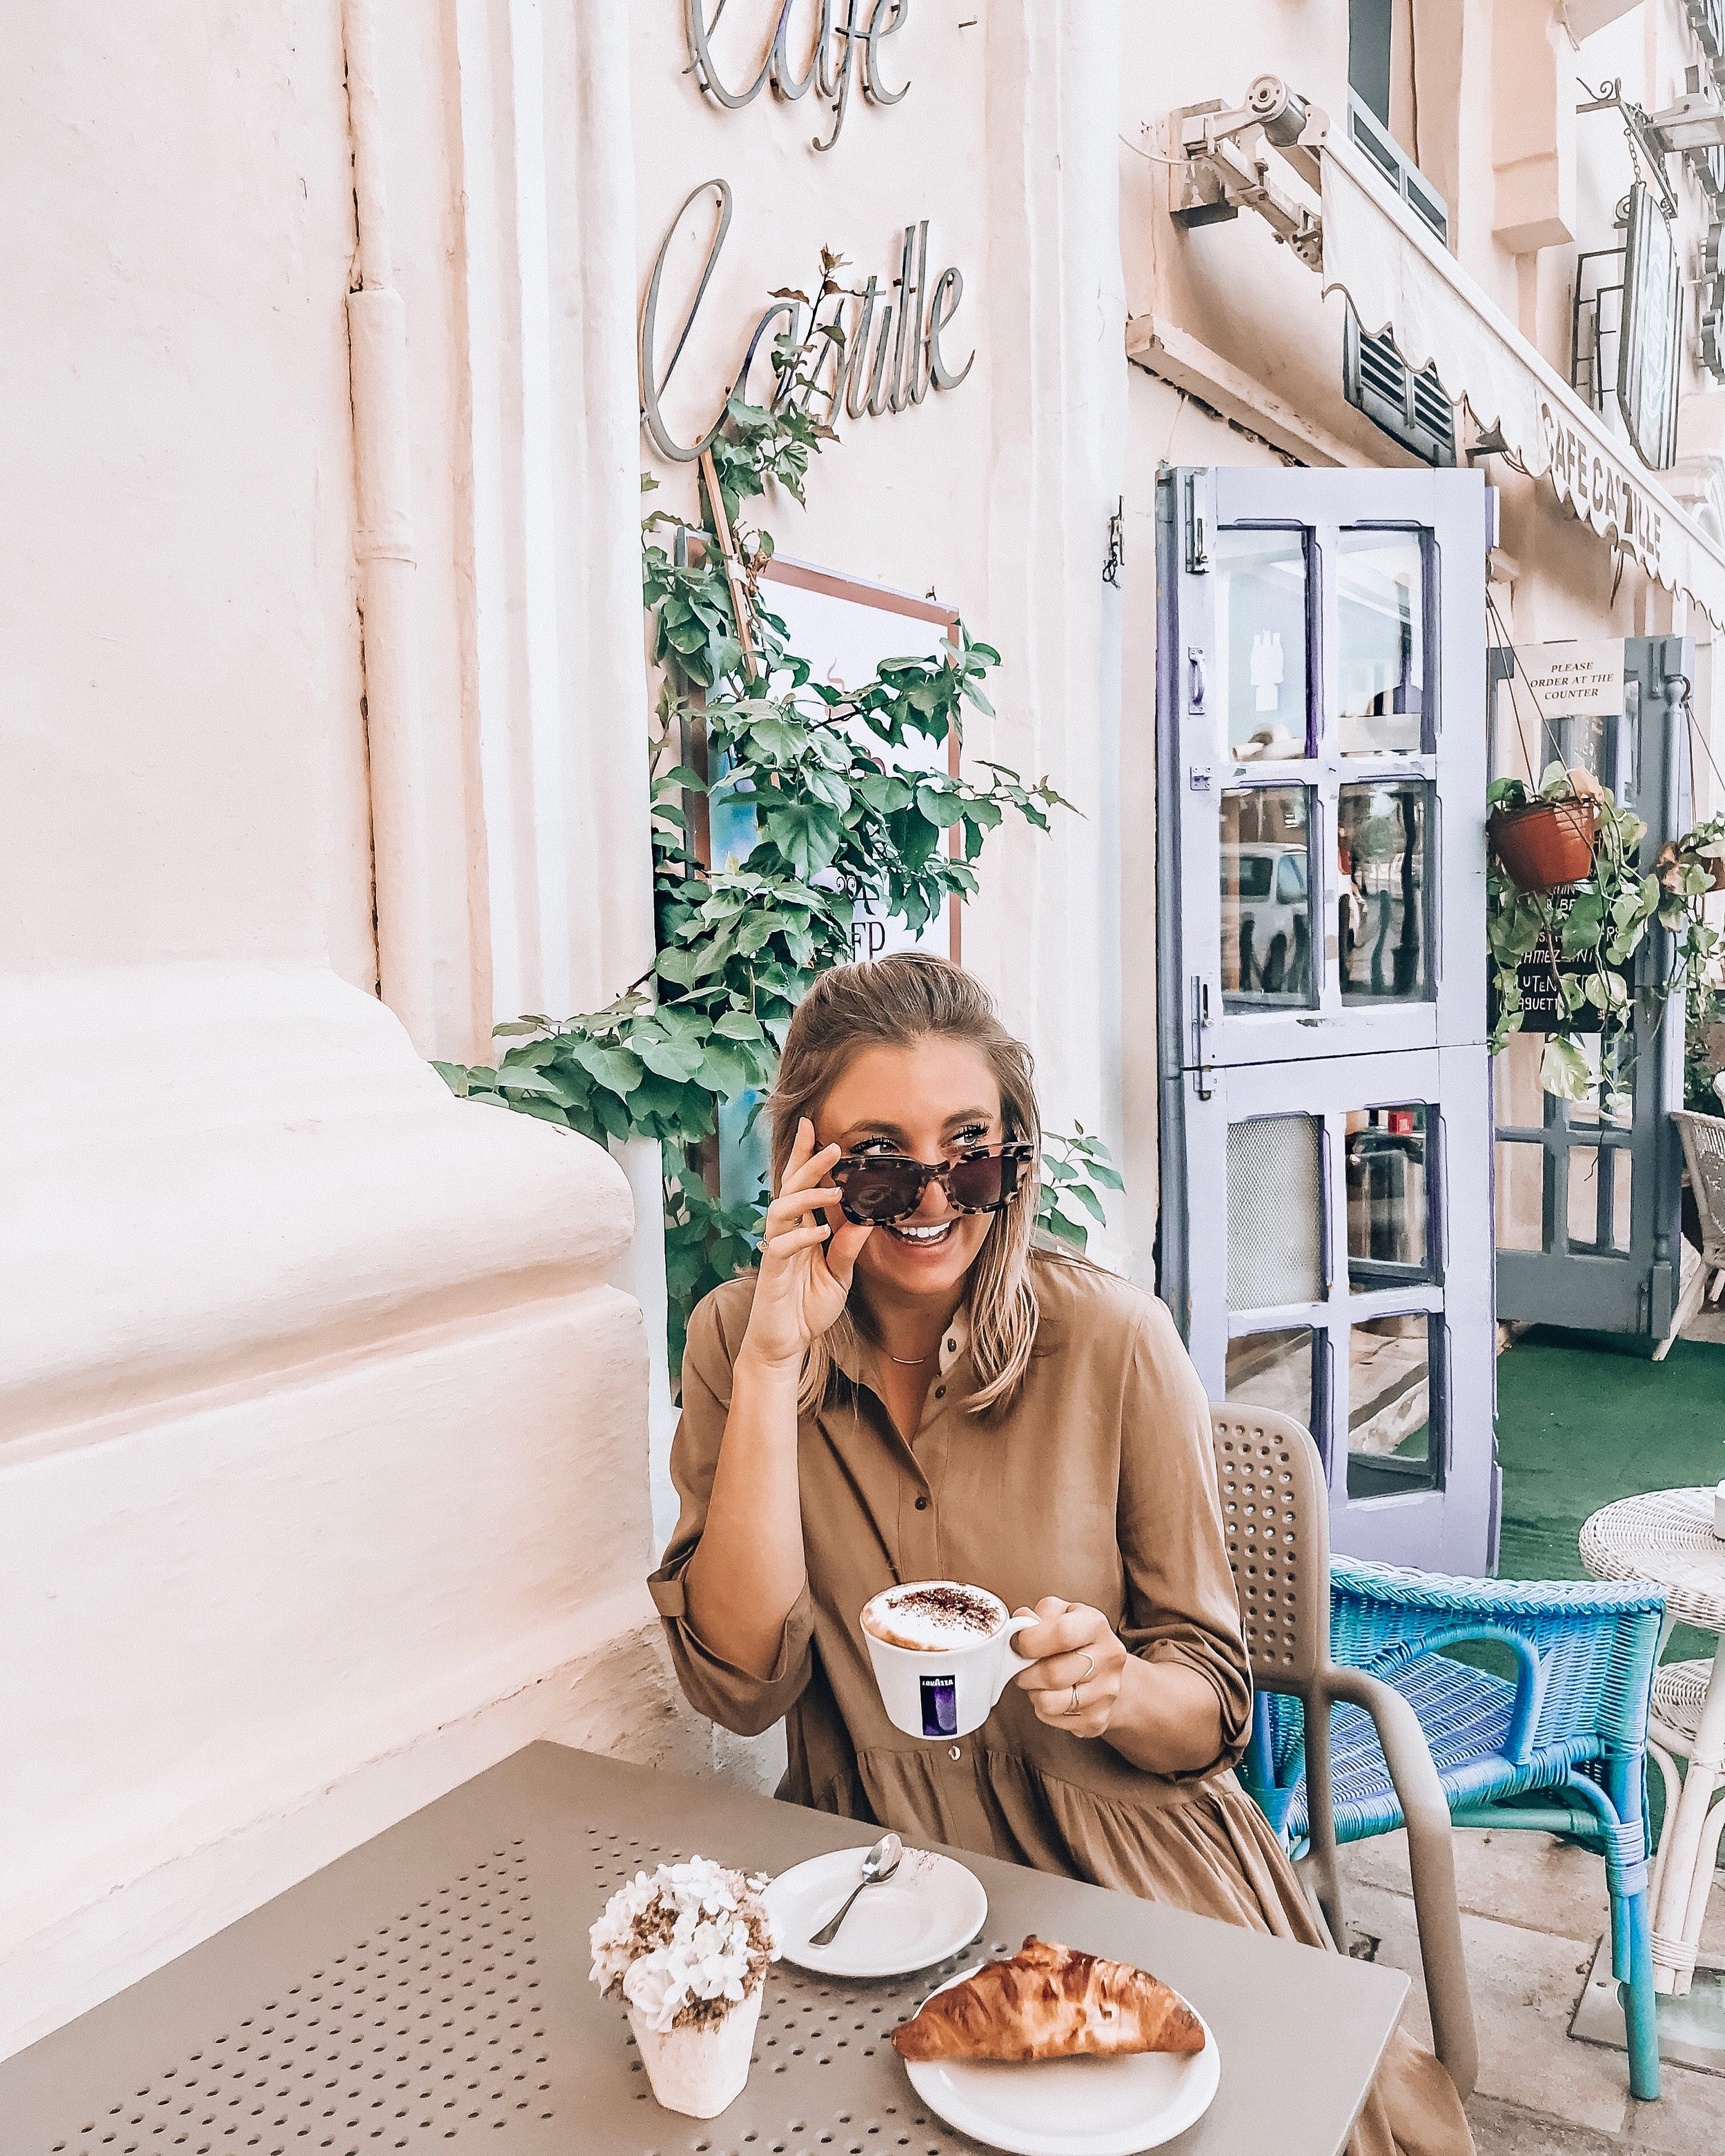 malta cafe